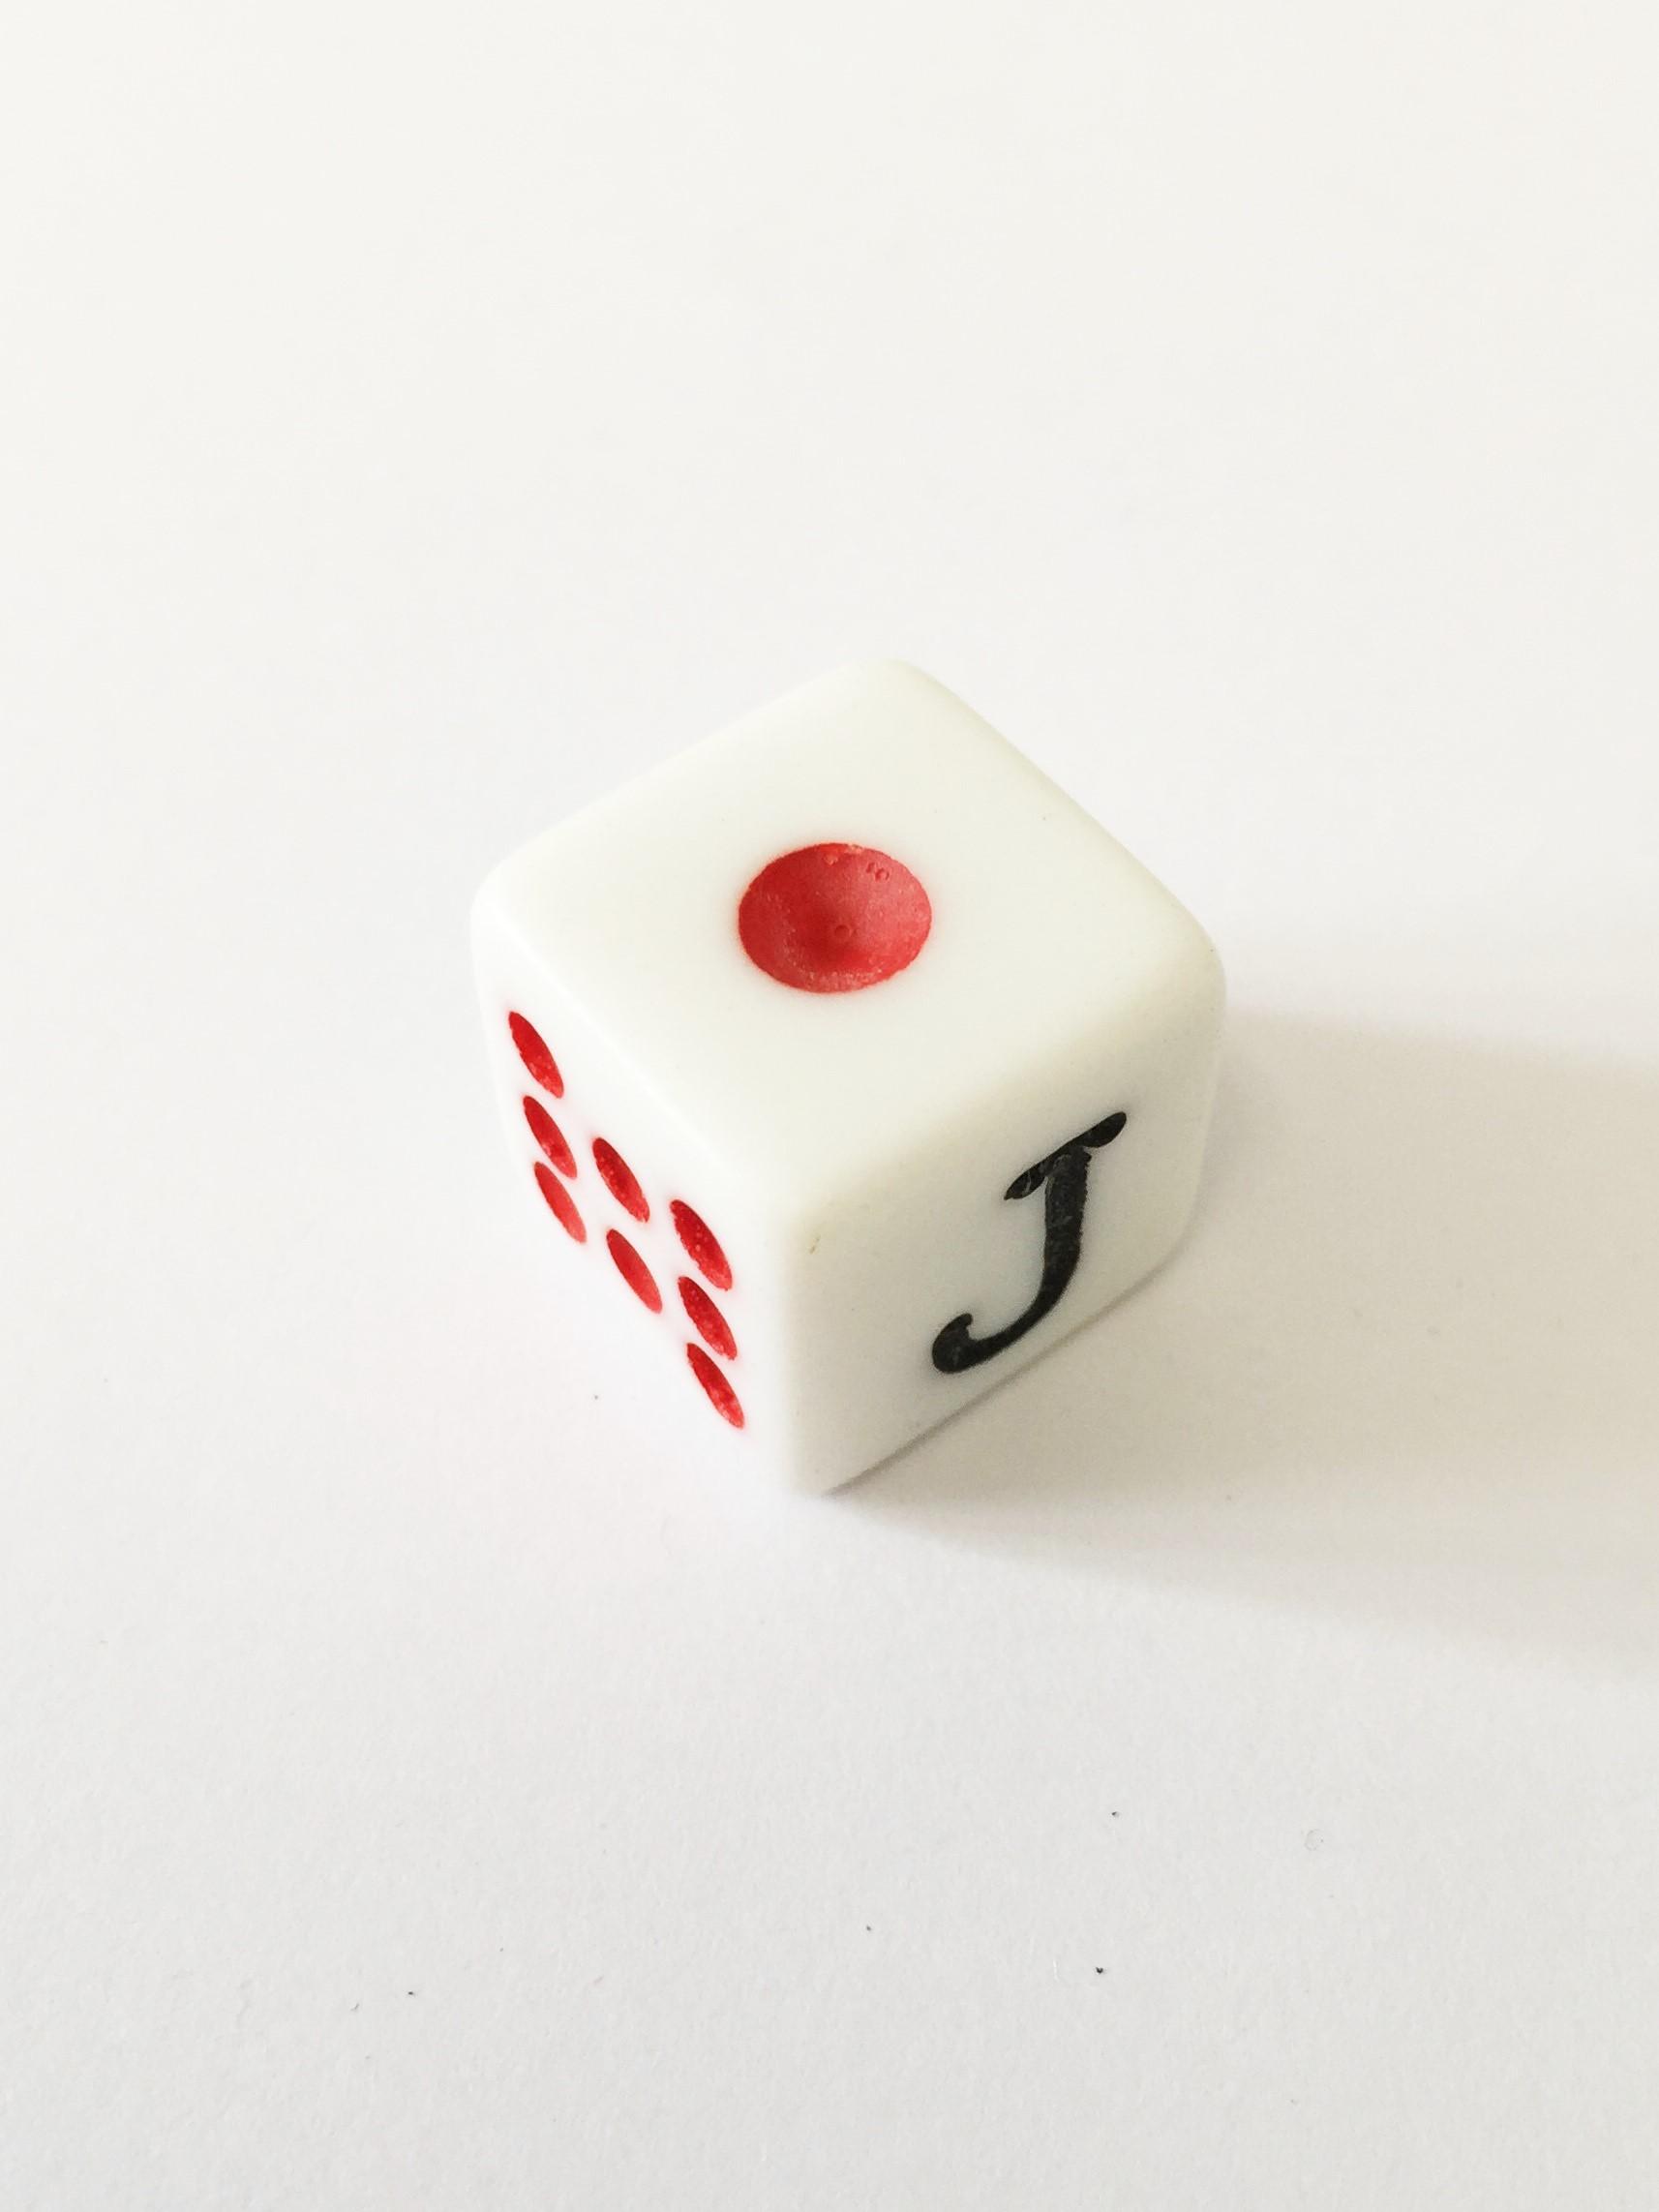 cubo D6 1D6 6 caras dado de poker